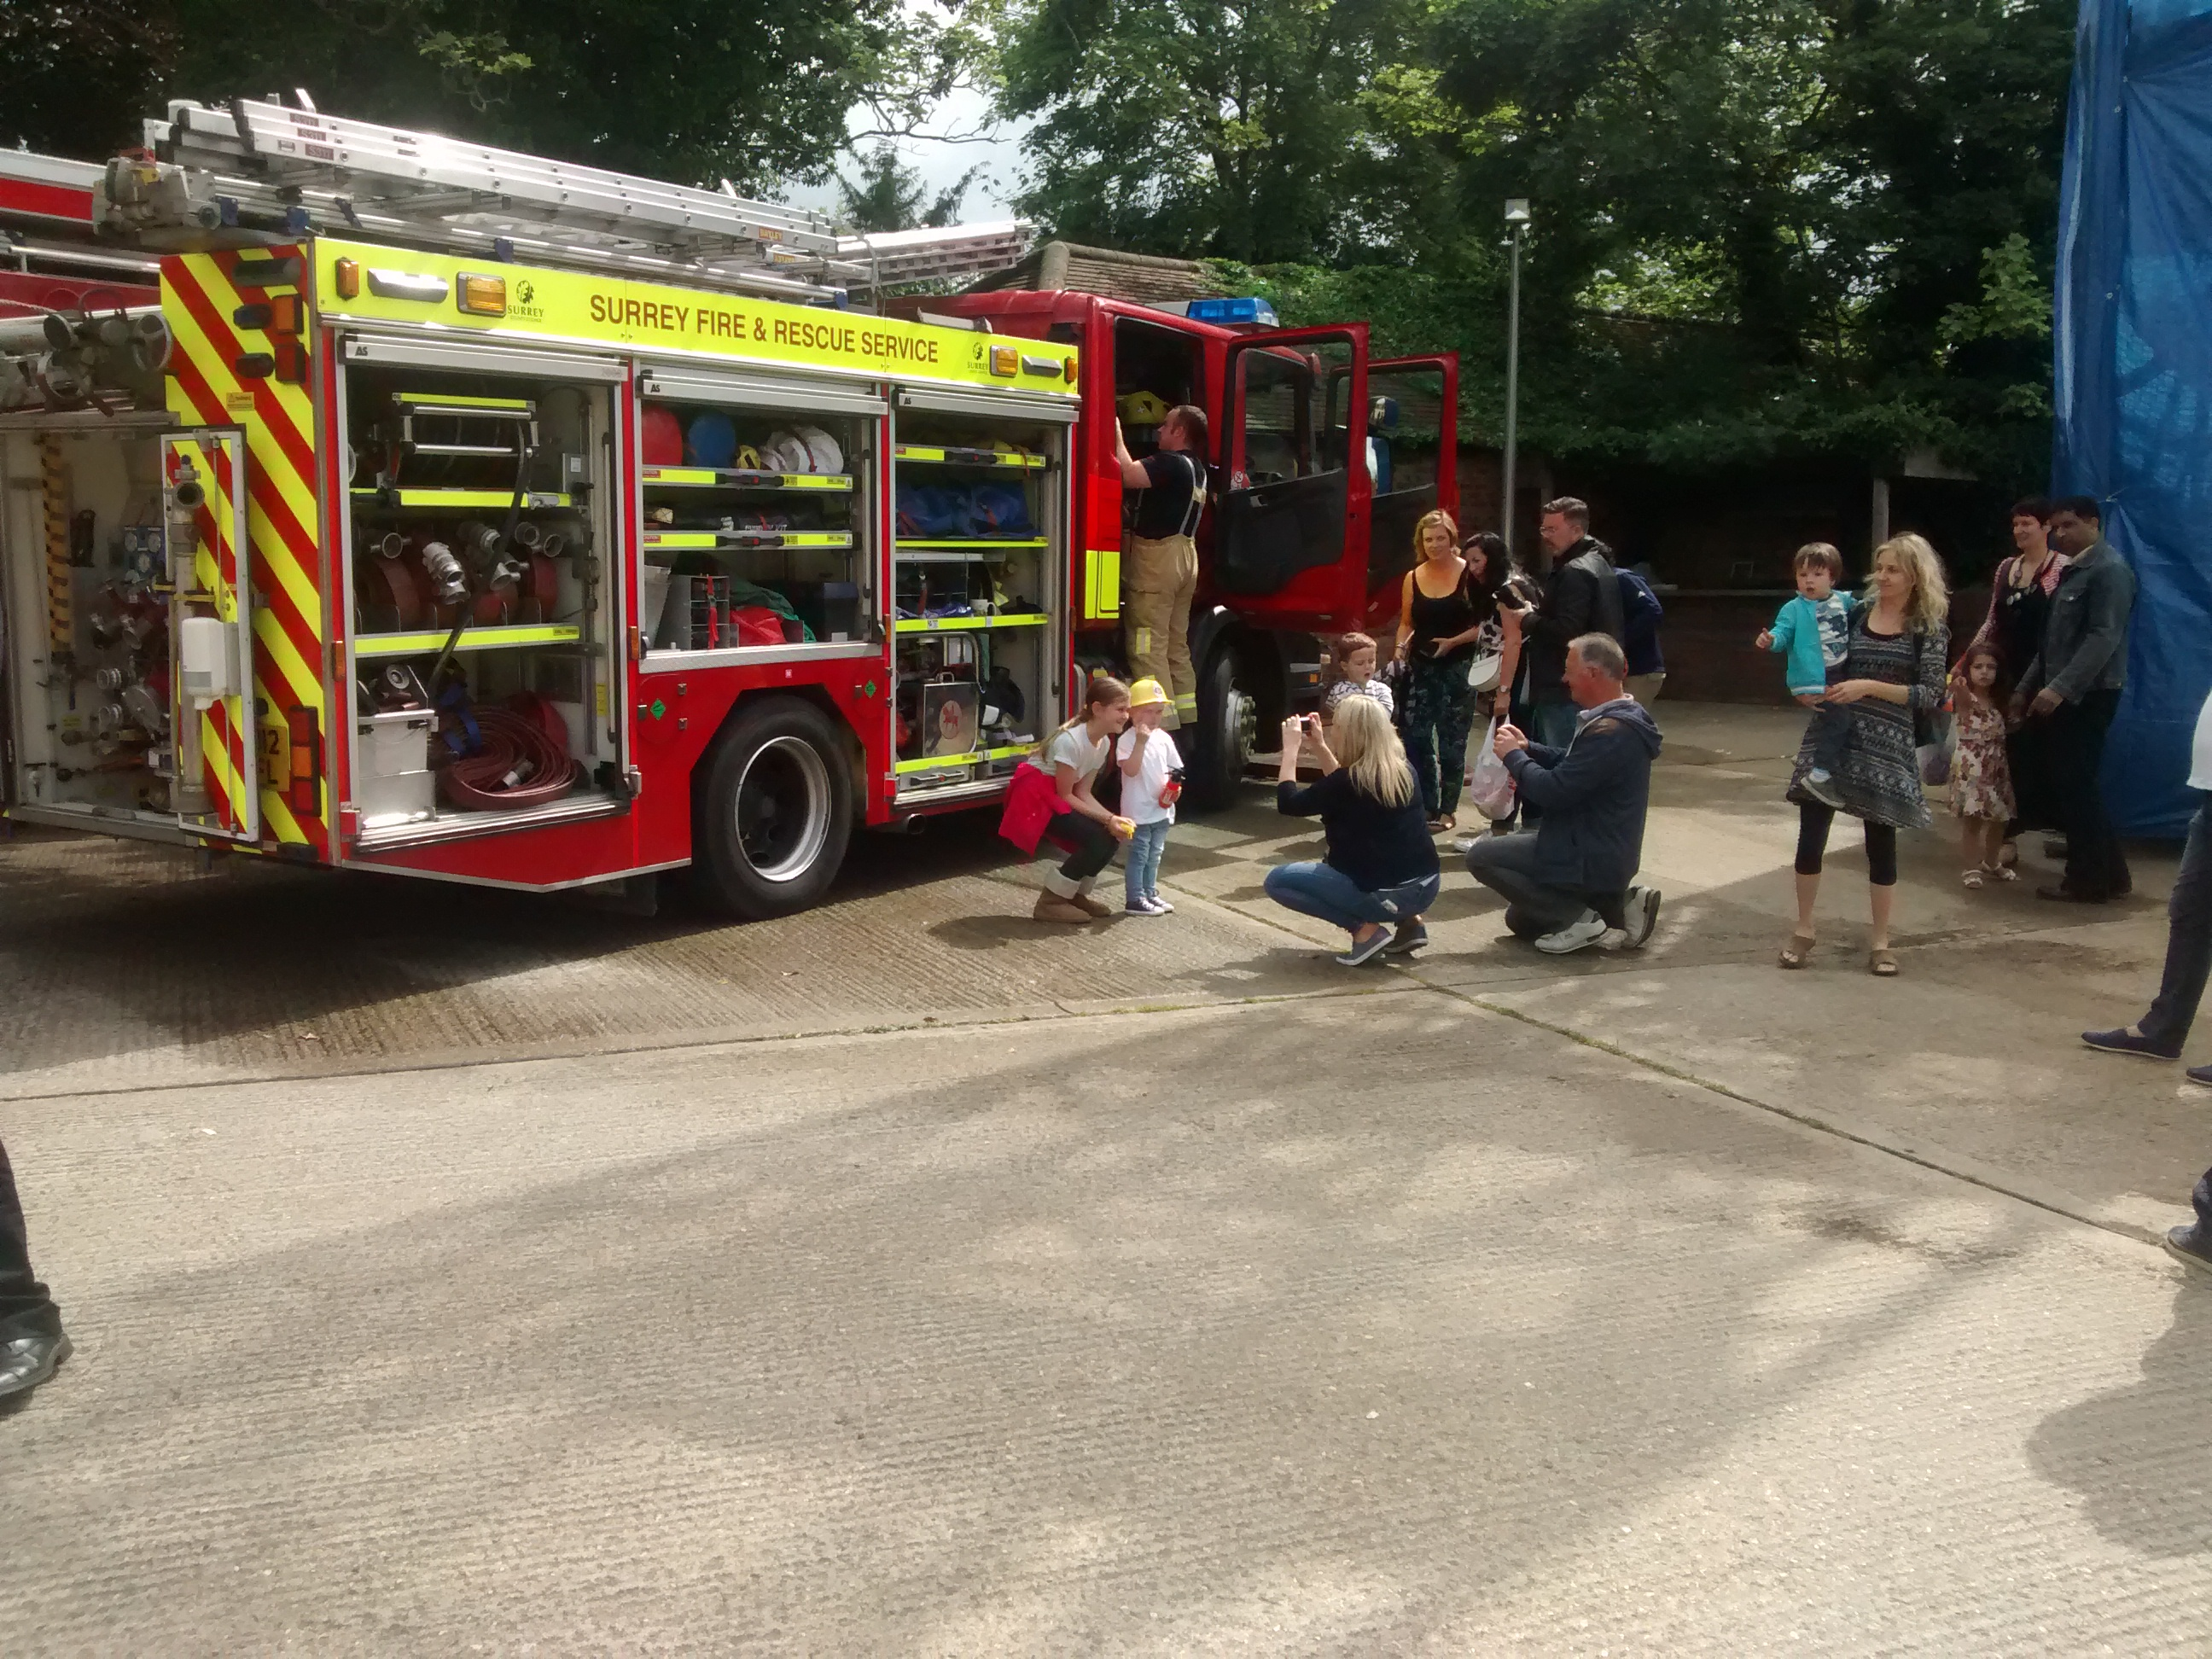 Foto 12. Open day Fire Station berarti anak-anak boleh naik truk pemadam kebakaran